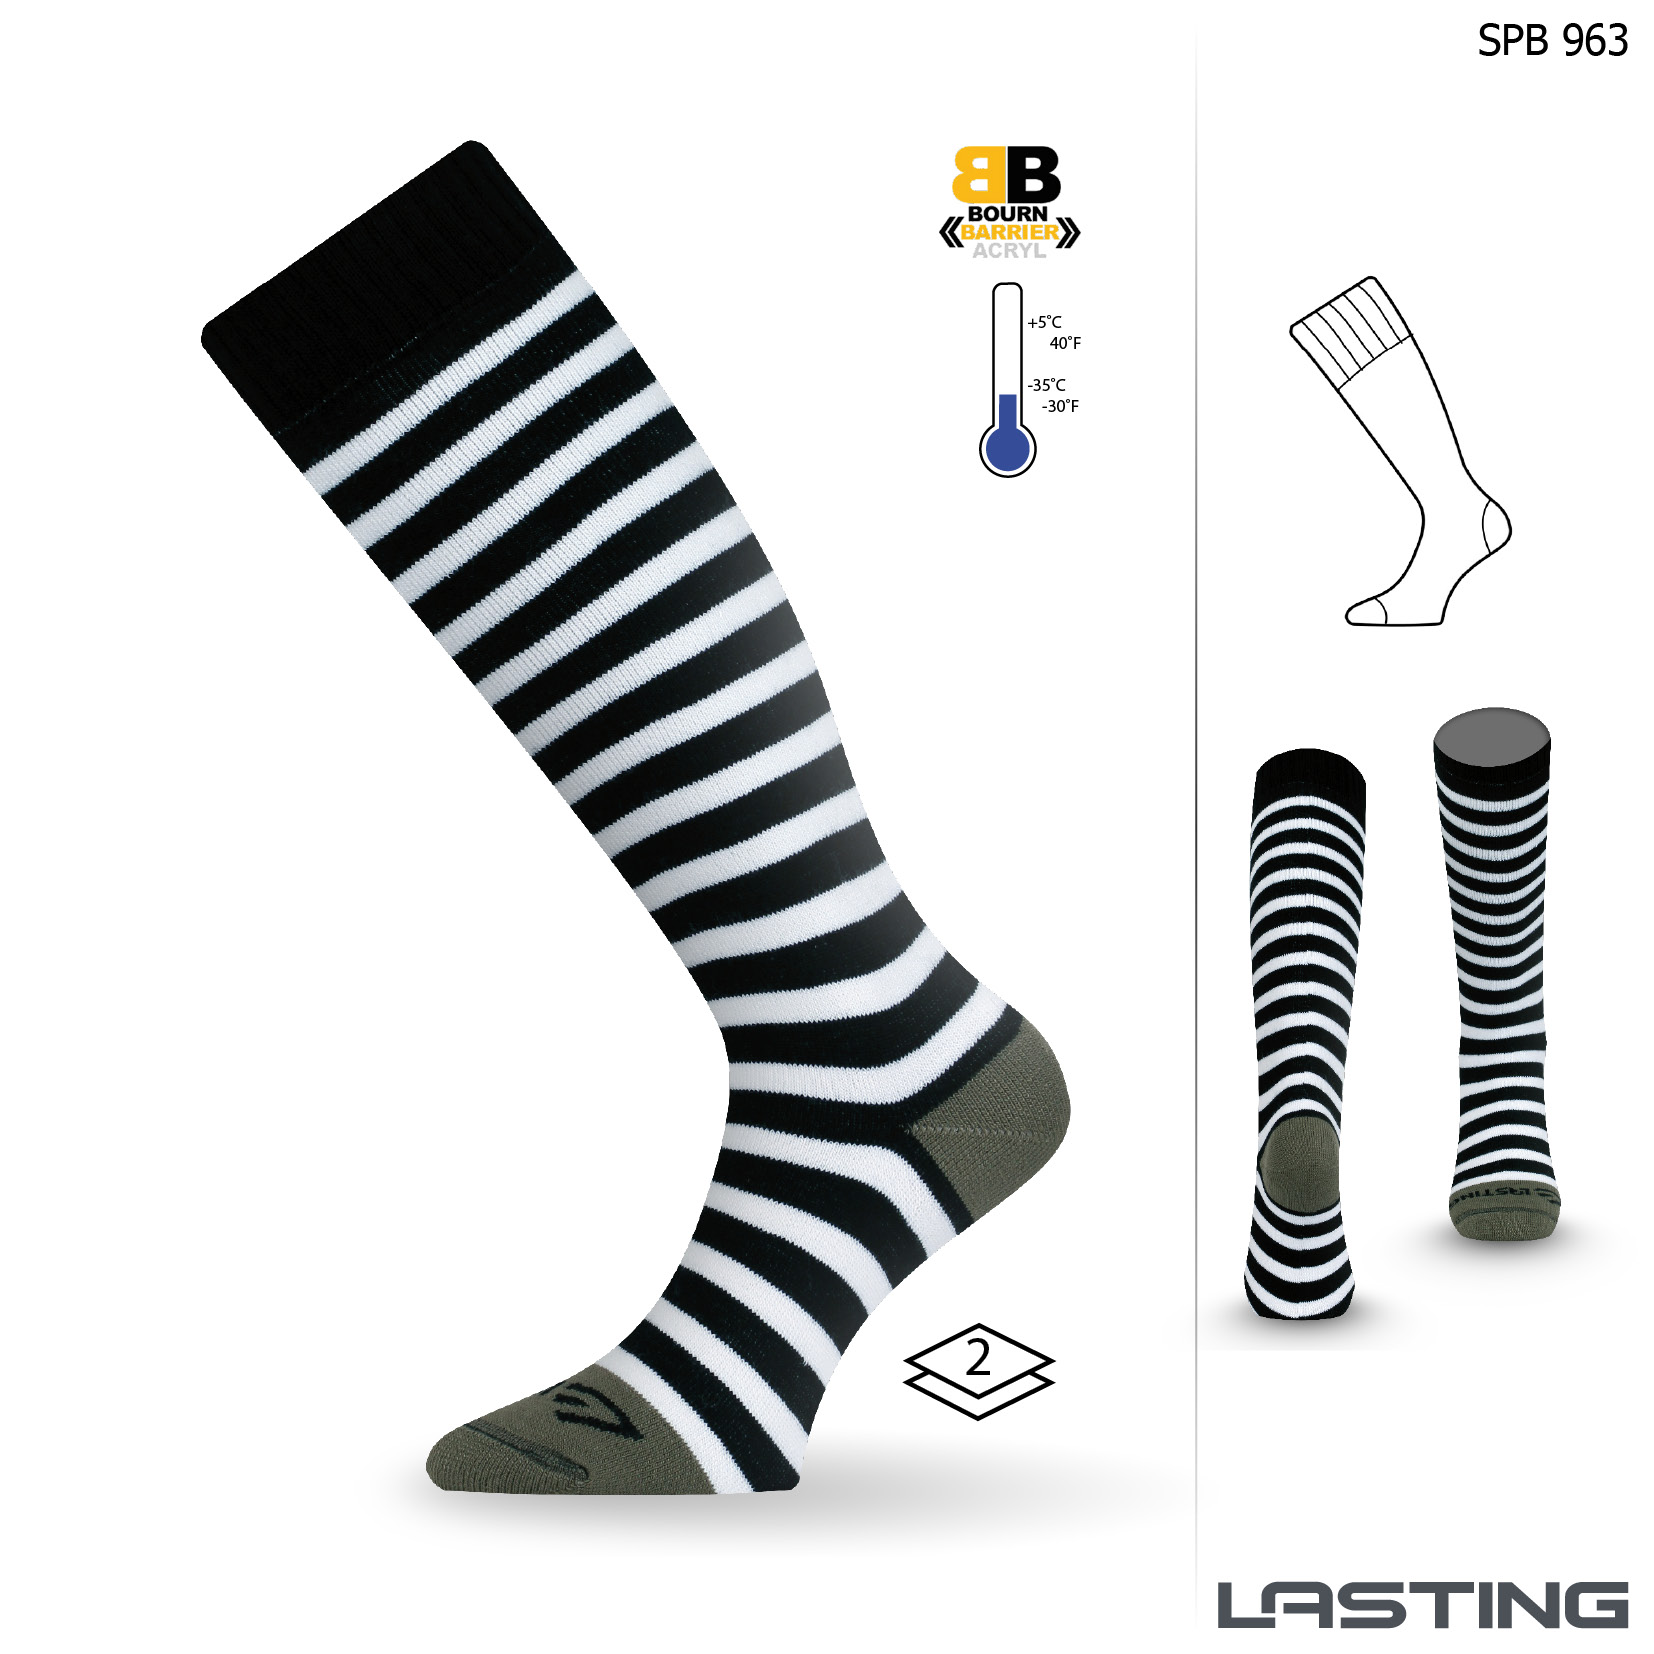 Snowboard ponožky SPB 963